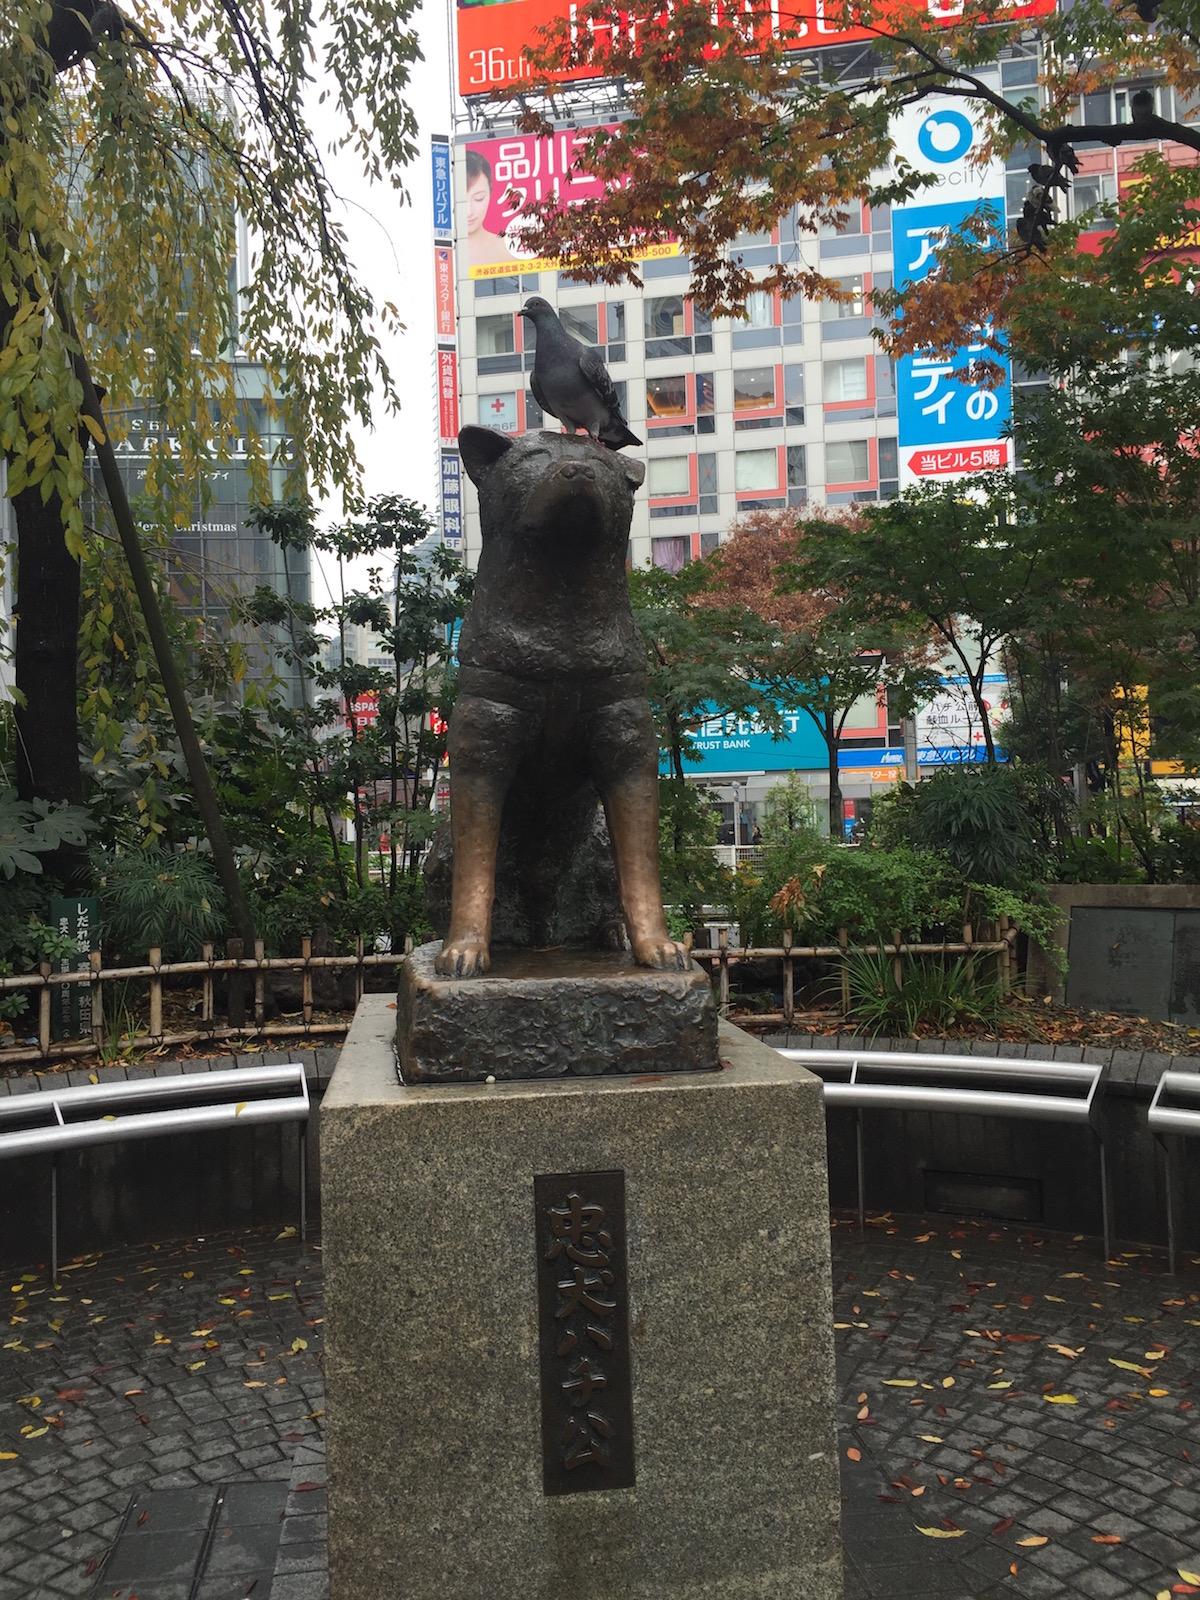 Tokyo Travel Guide Hachiko statue